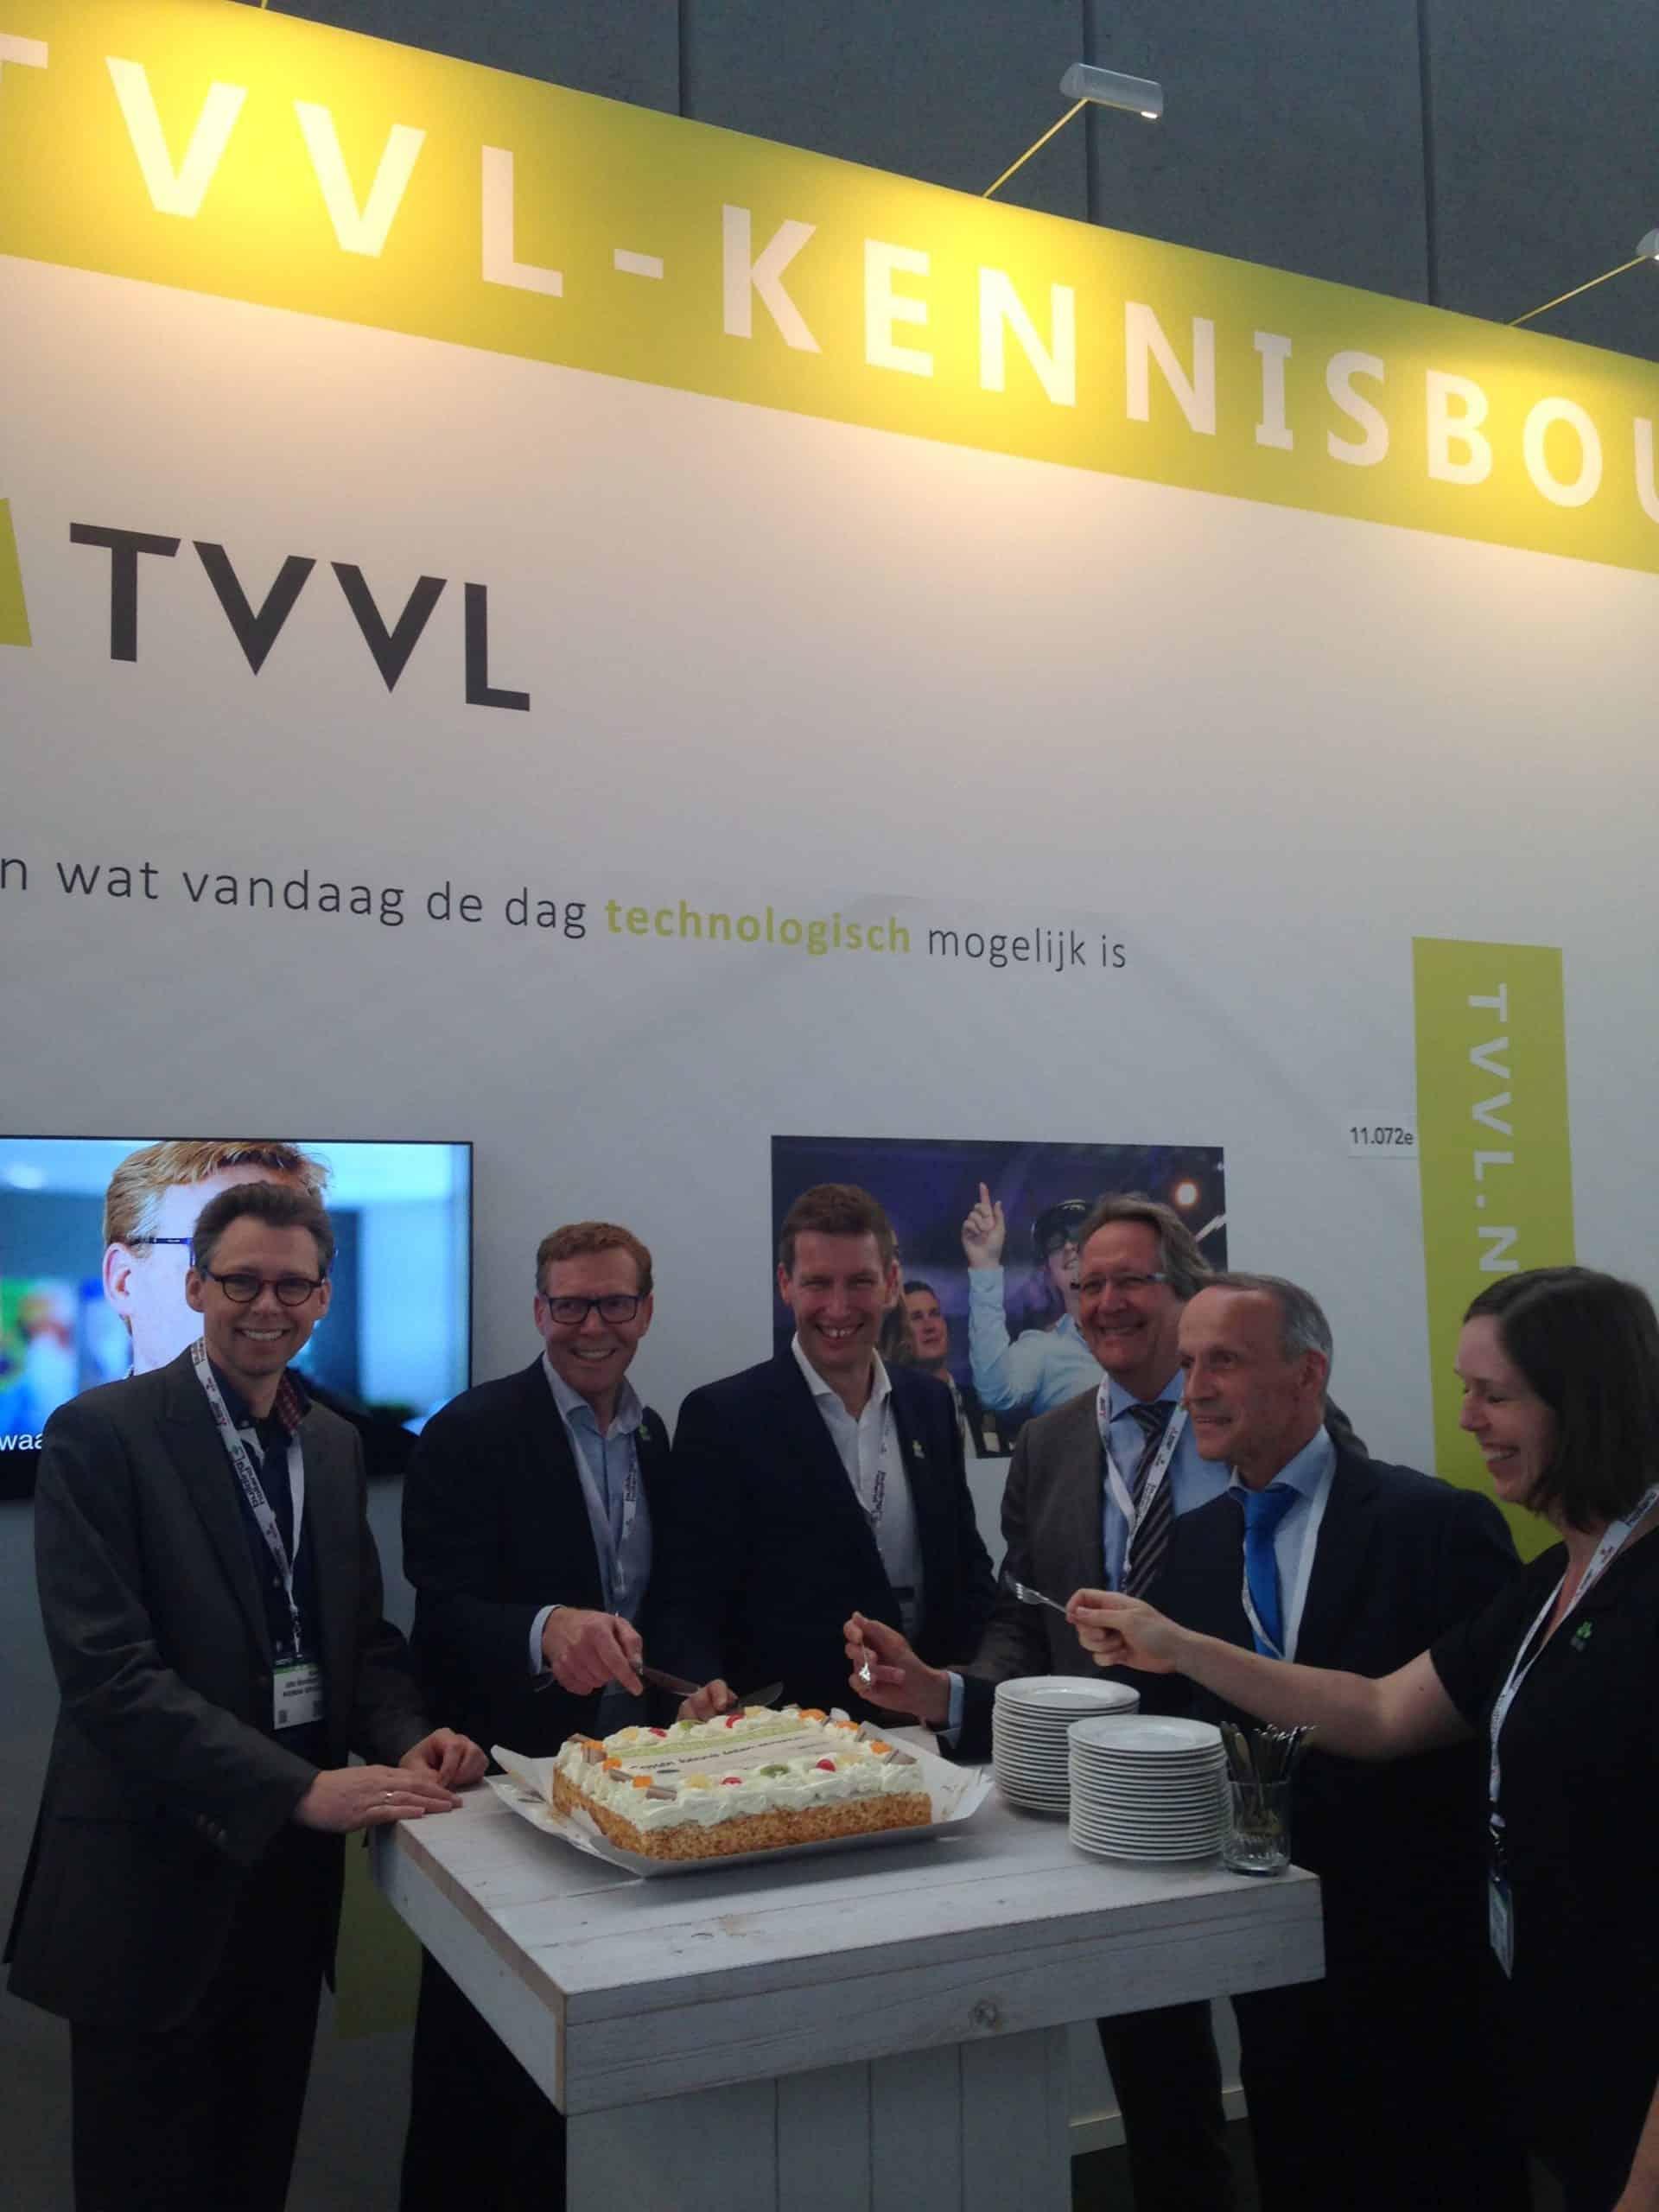 TVVL kennispartners op Building Holland 2017